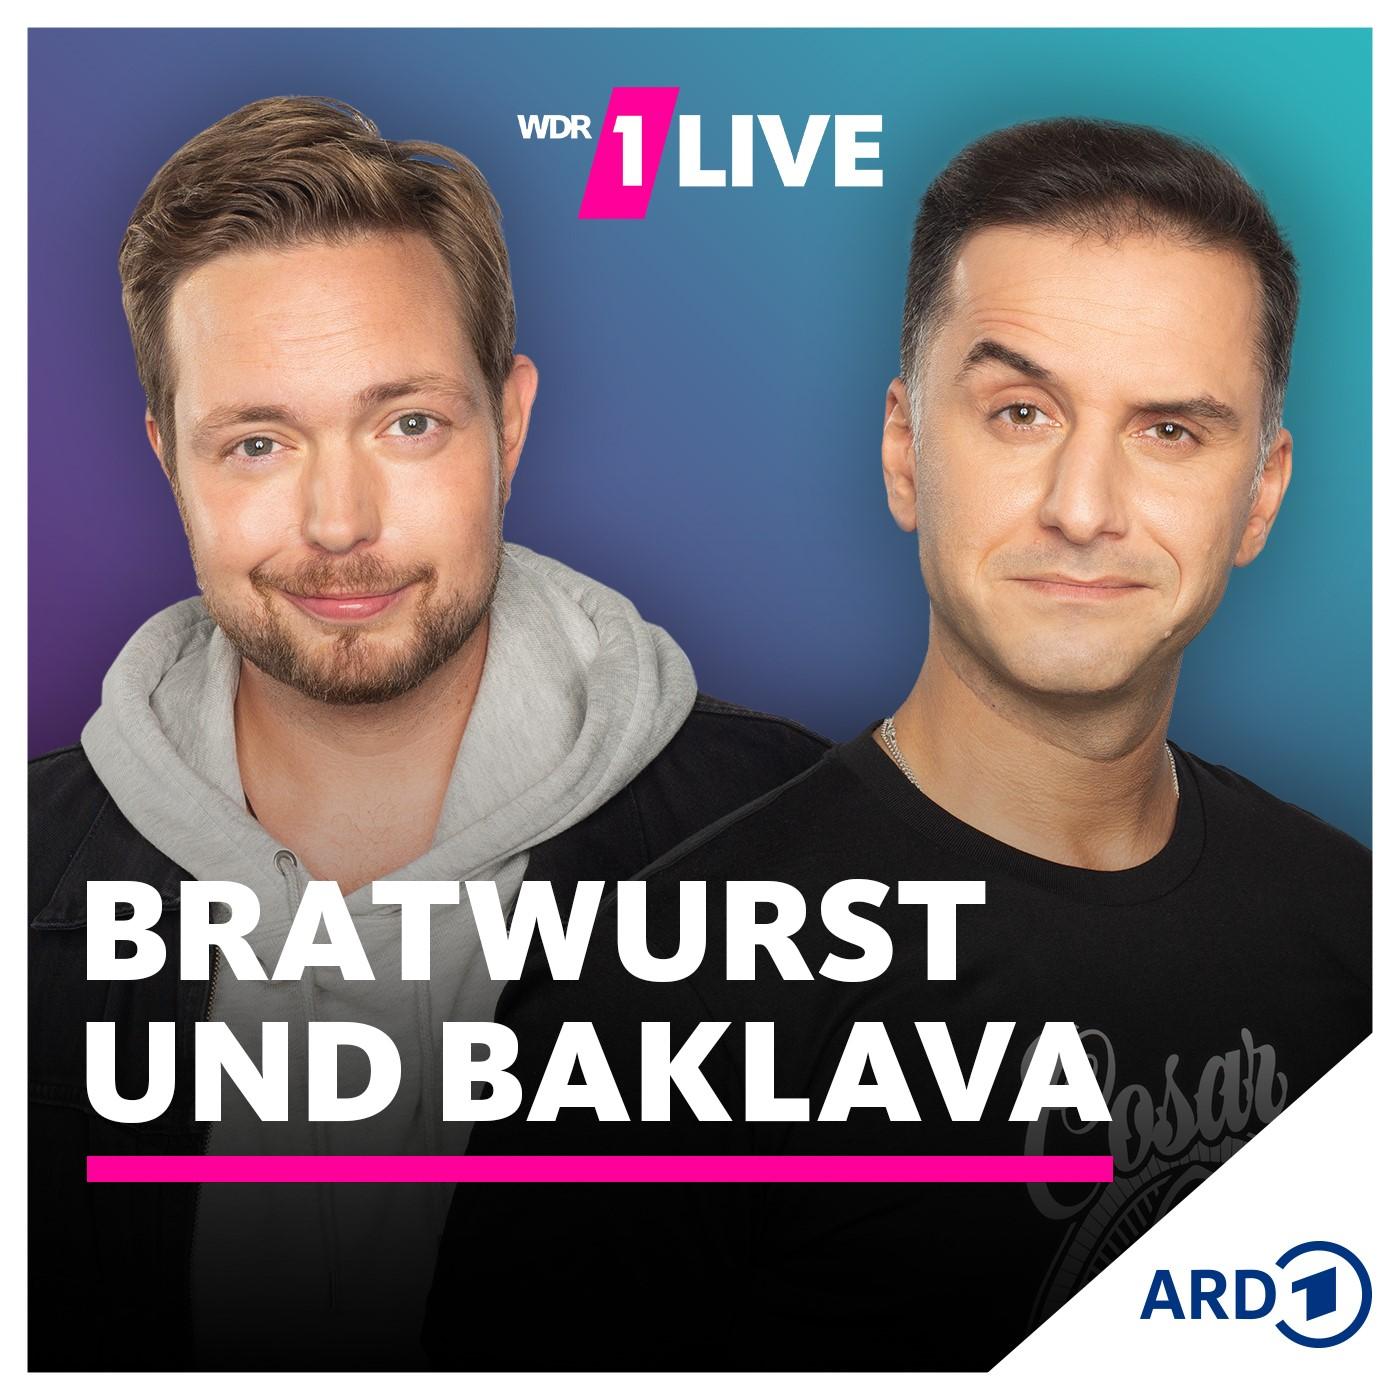 1LIVE Bratwurst und Baklava logo